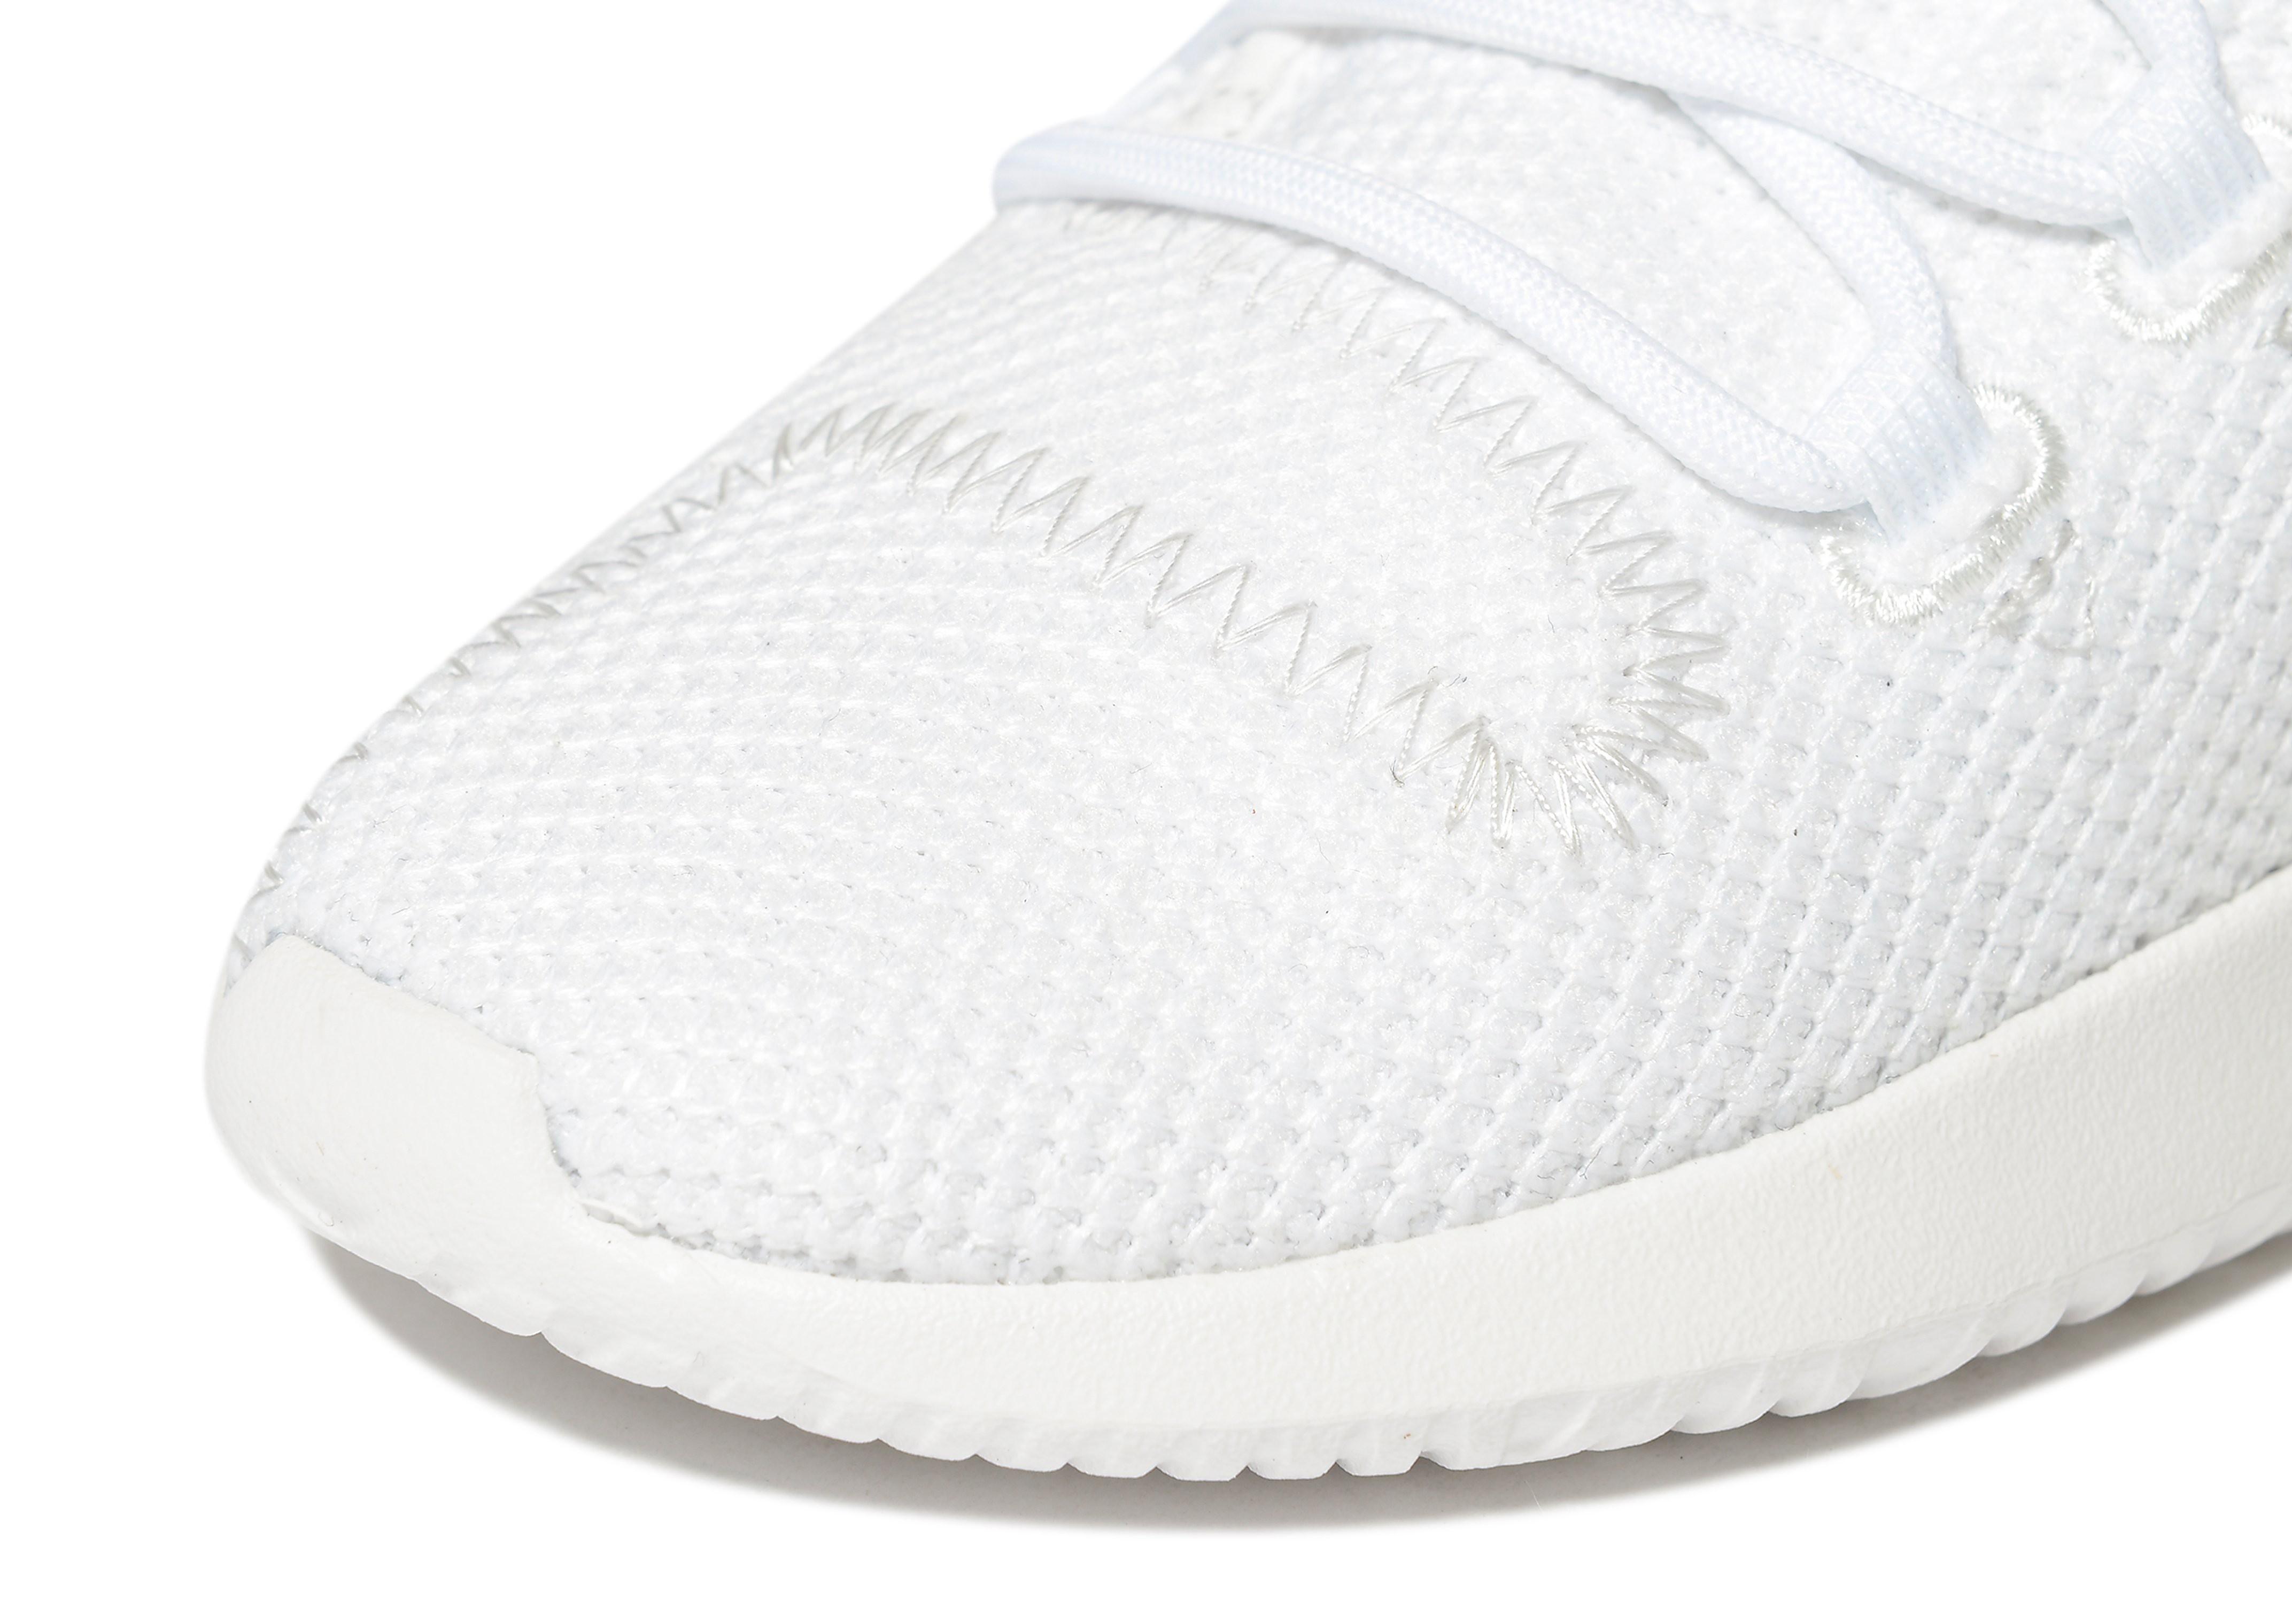 adidas Originals Tubular Shadow Infant